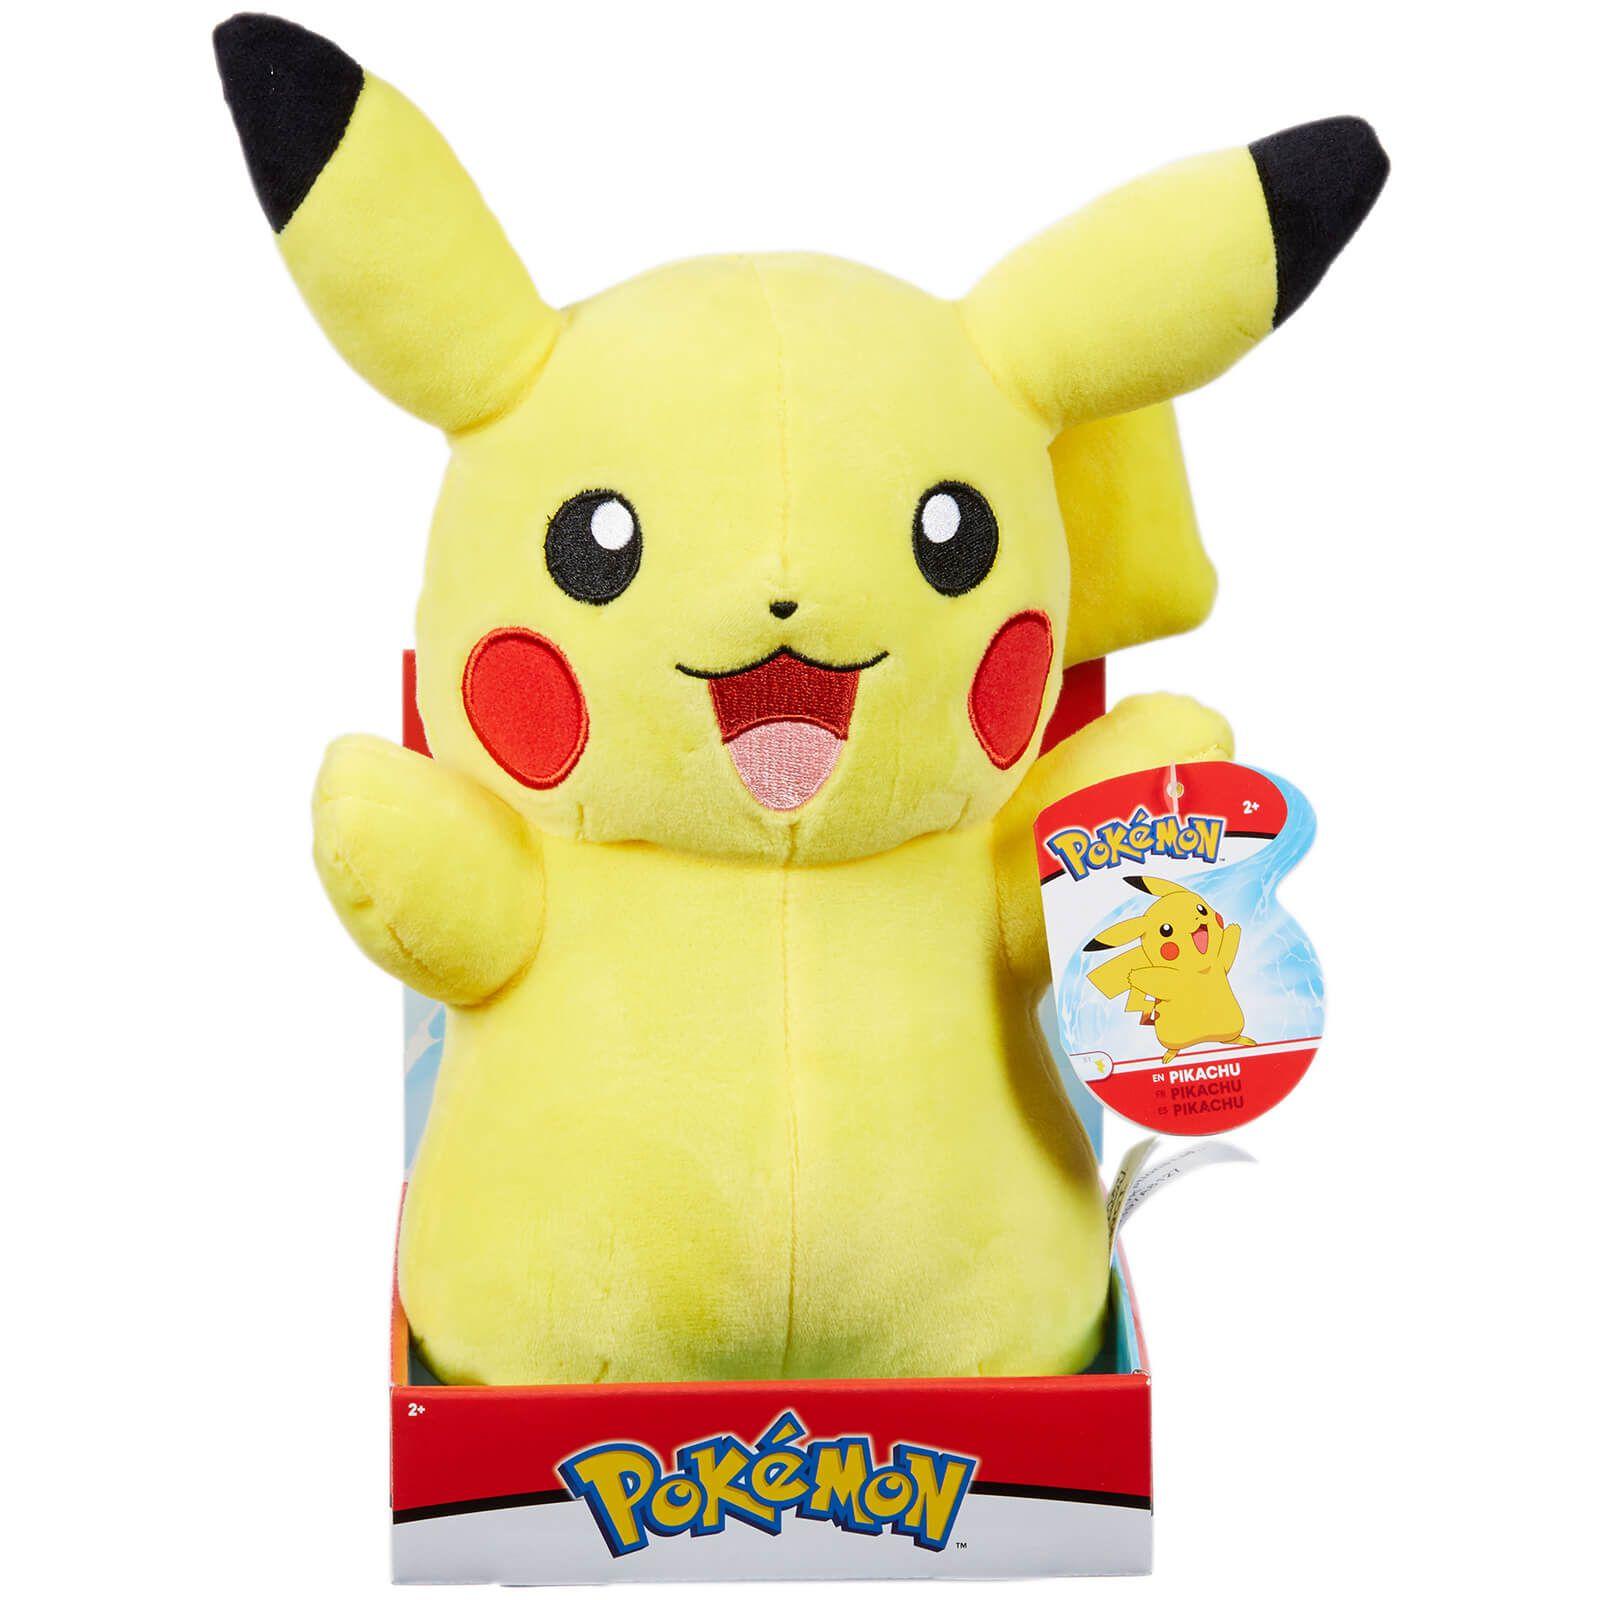 Pelúcia Pikachu: Pokémon - DTC